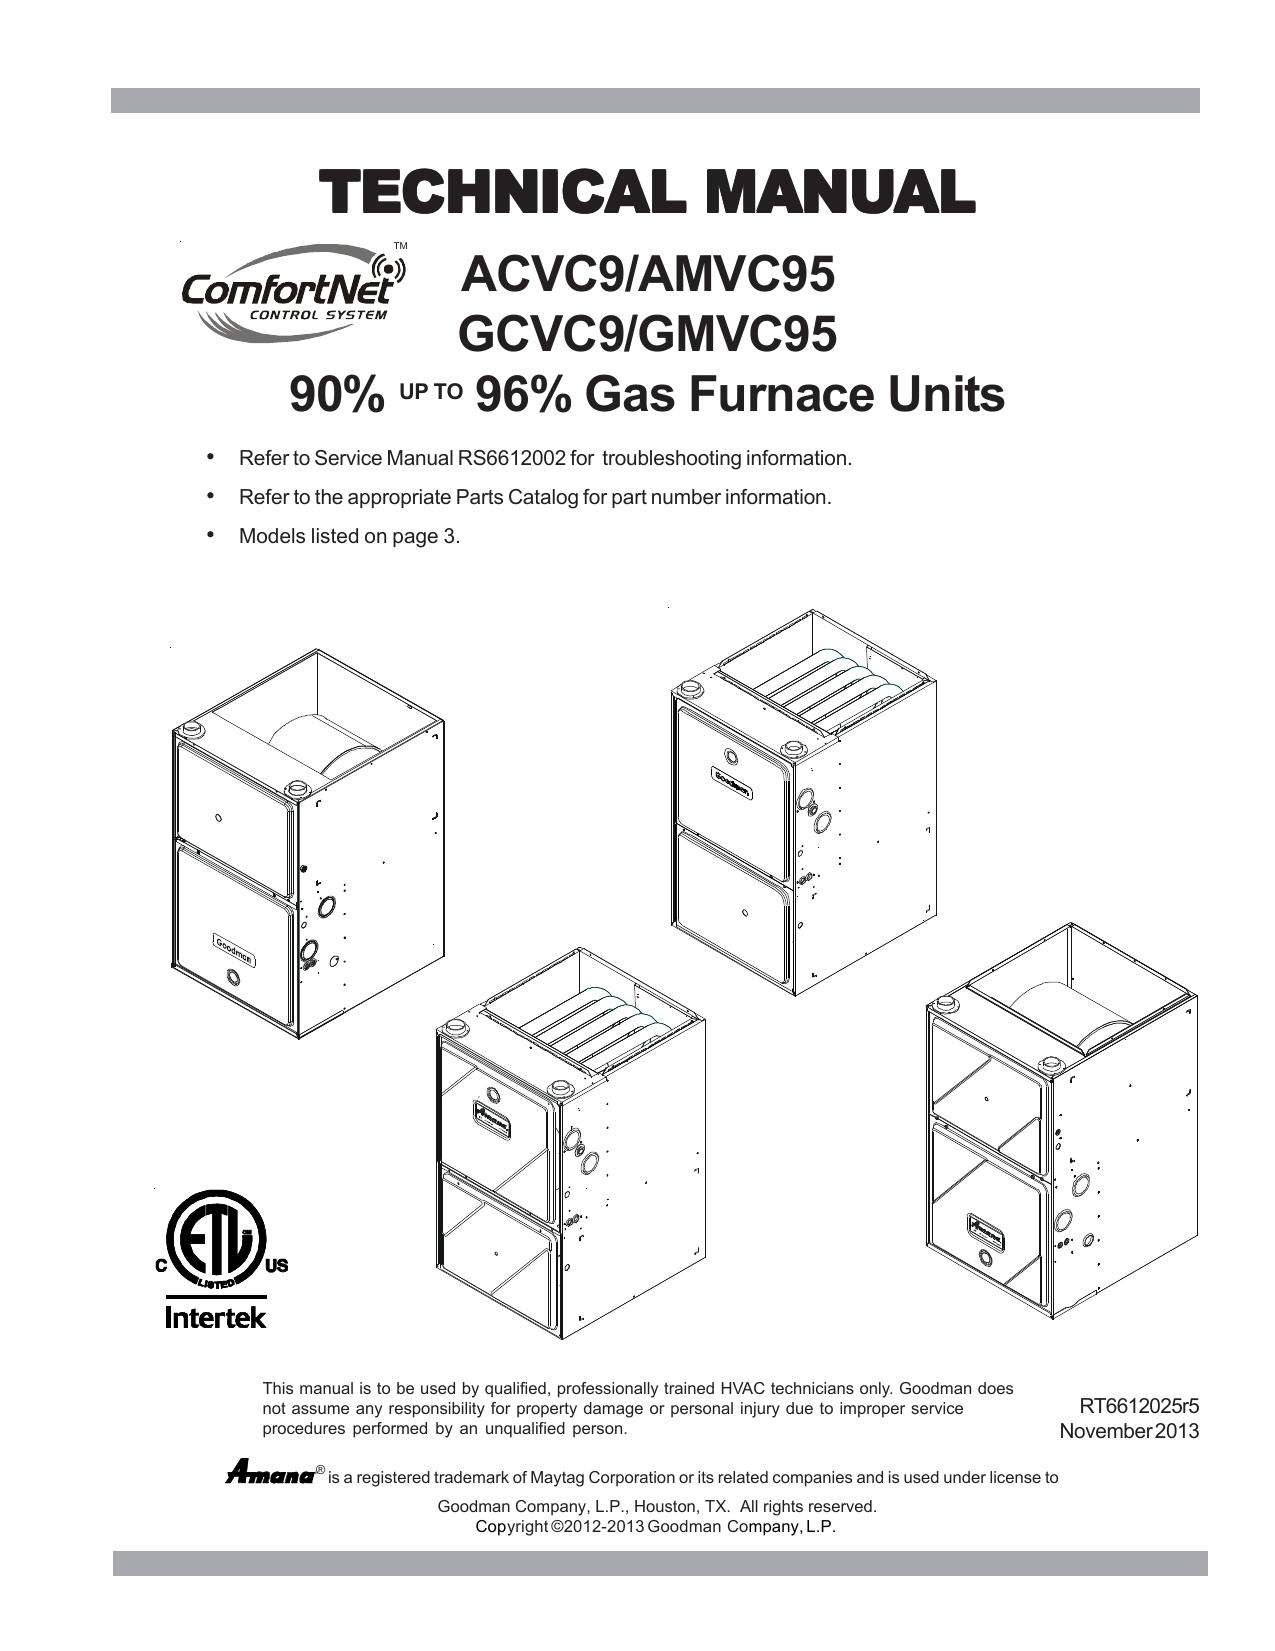 100 meile service manual miele g 6475 scvi manual comfortnet amvc95 service manual